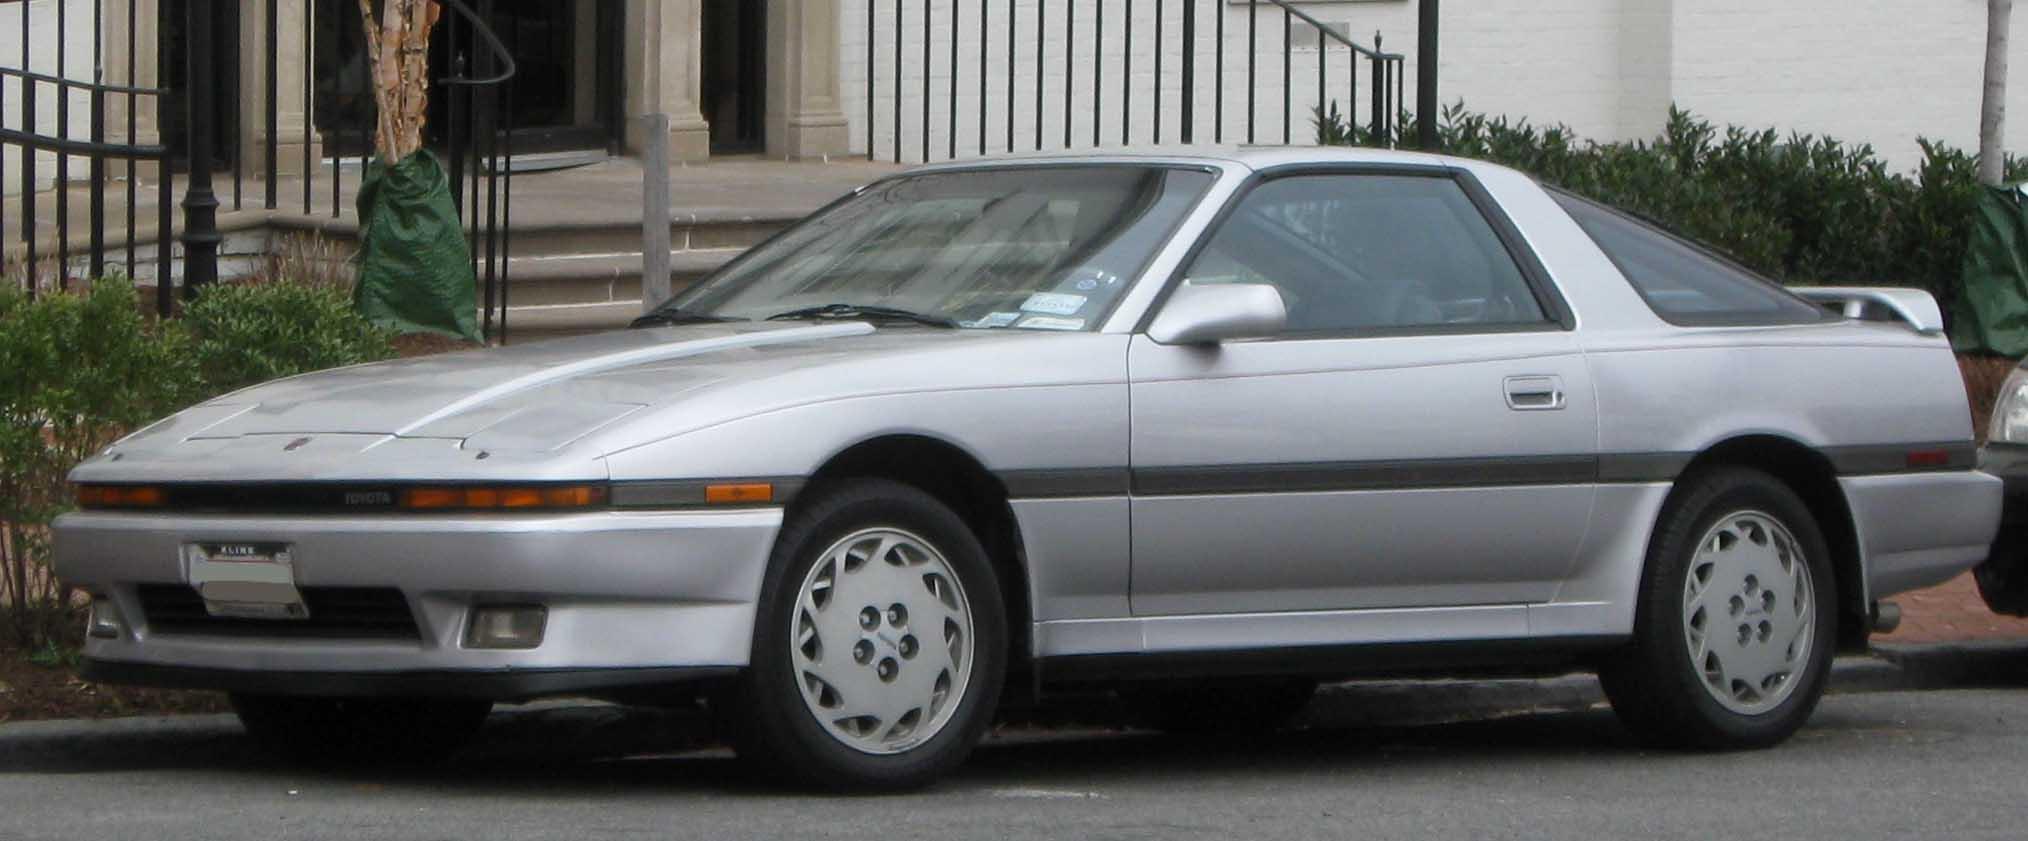 File:3rd Toyota Supra